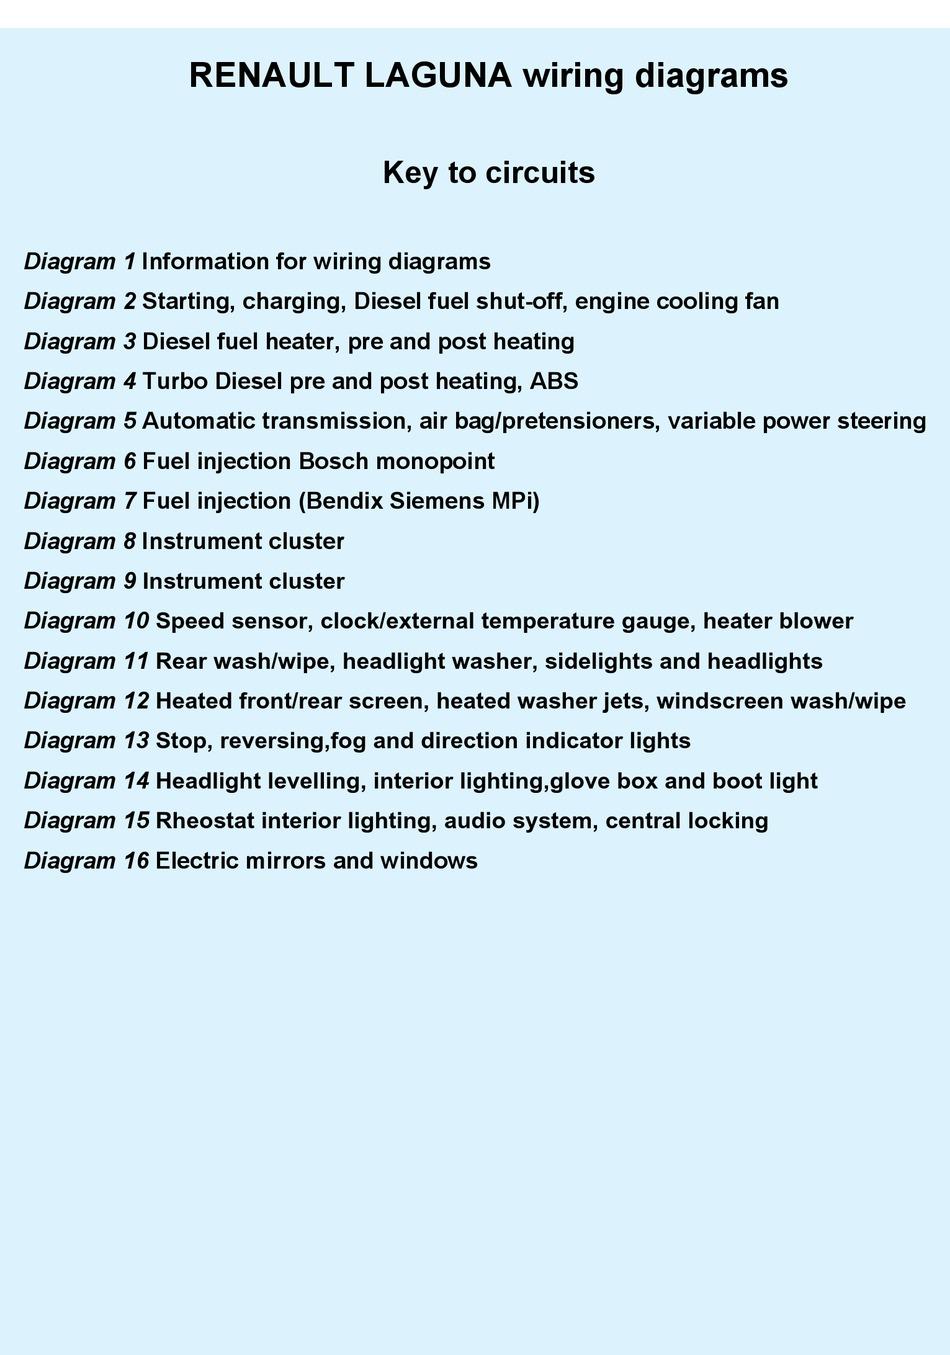 RENAULT LAGUNA WIRING DIAGRAMS Pdf Download   ManualsLib